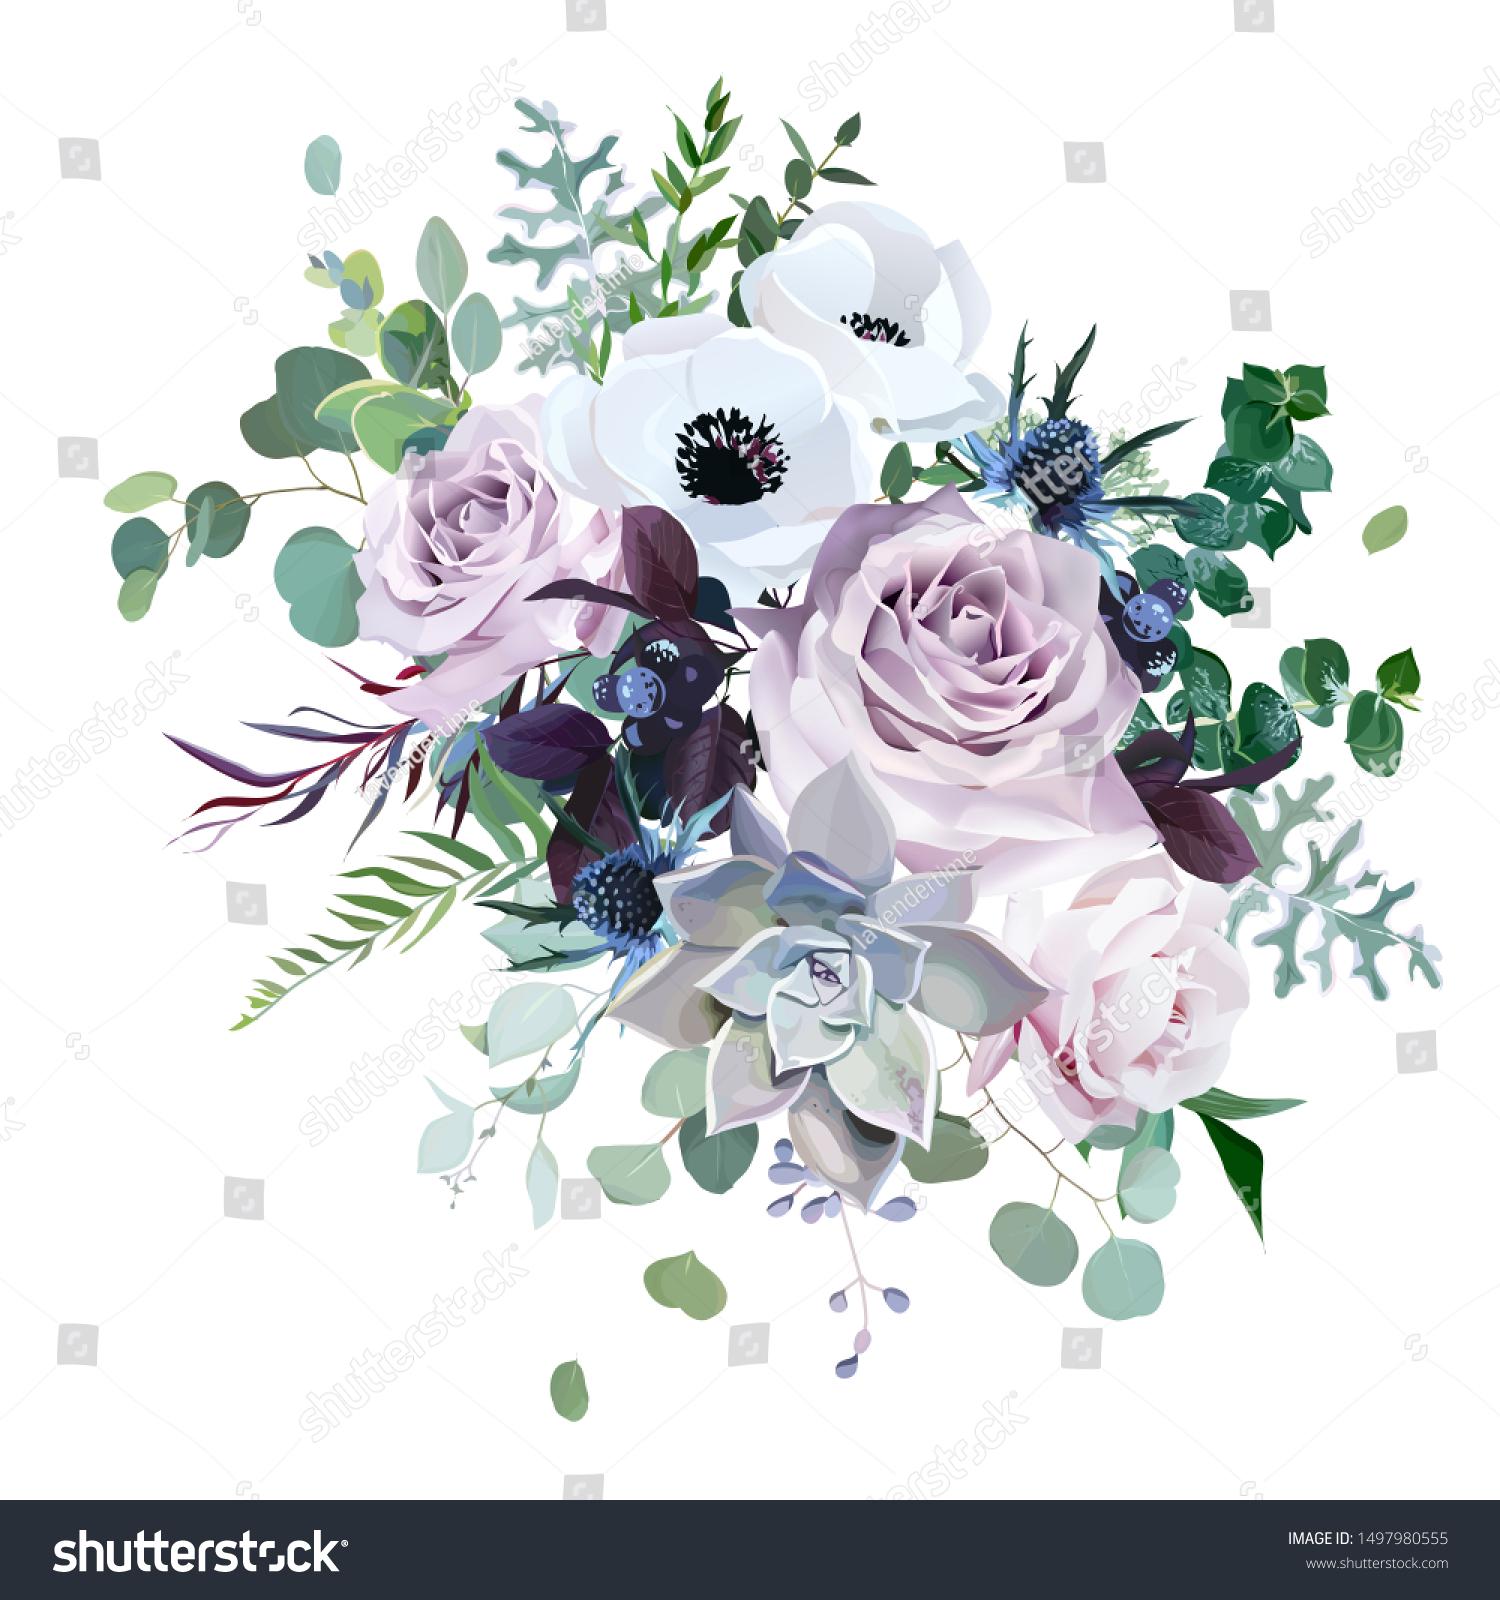 Dusty Violet Lavender Mauve Antique Rose Stock Vector Royalty Free 1497980555